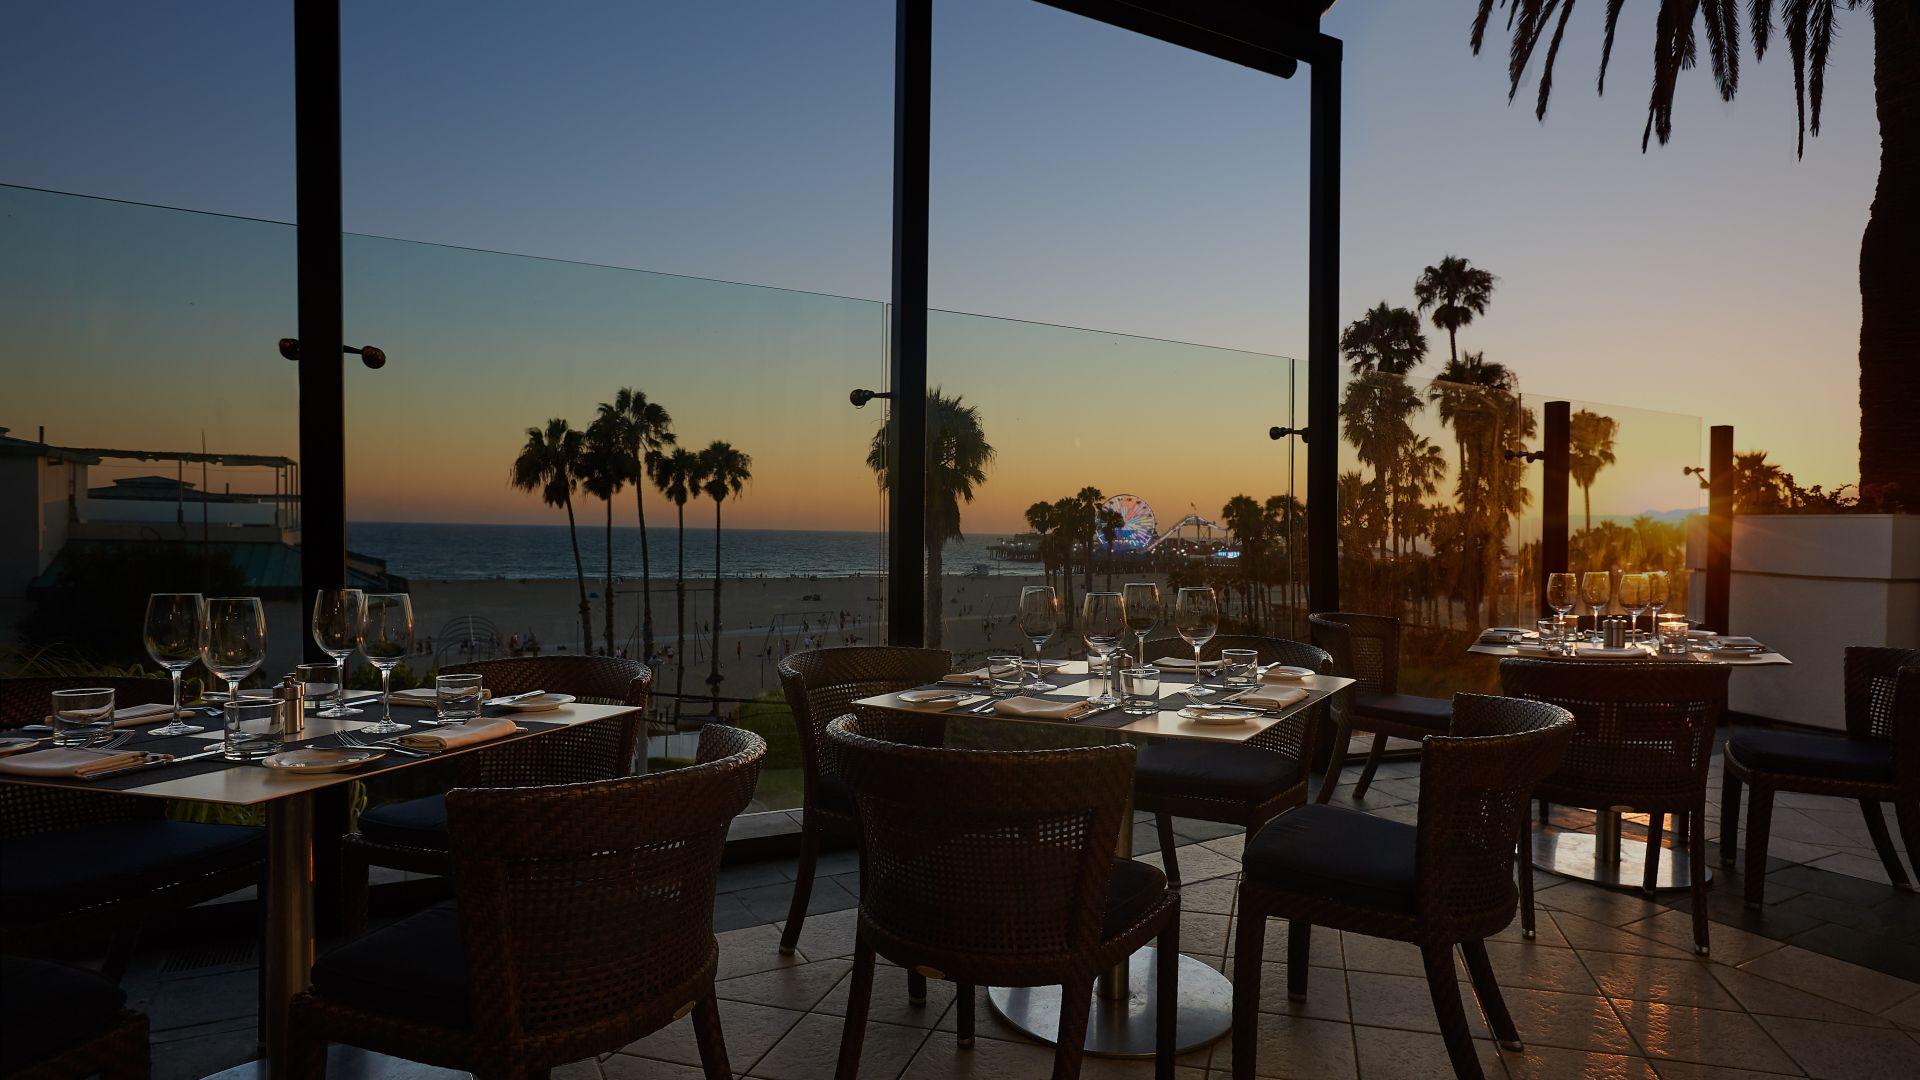 Santa Monica Beach Breakfast Restaurants